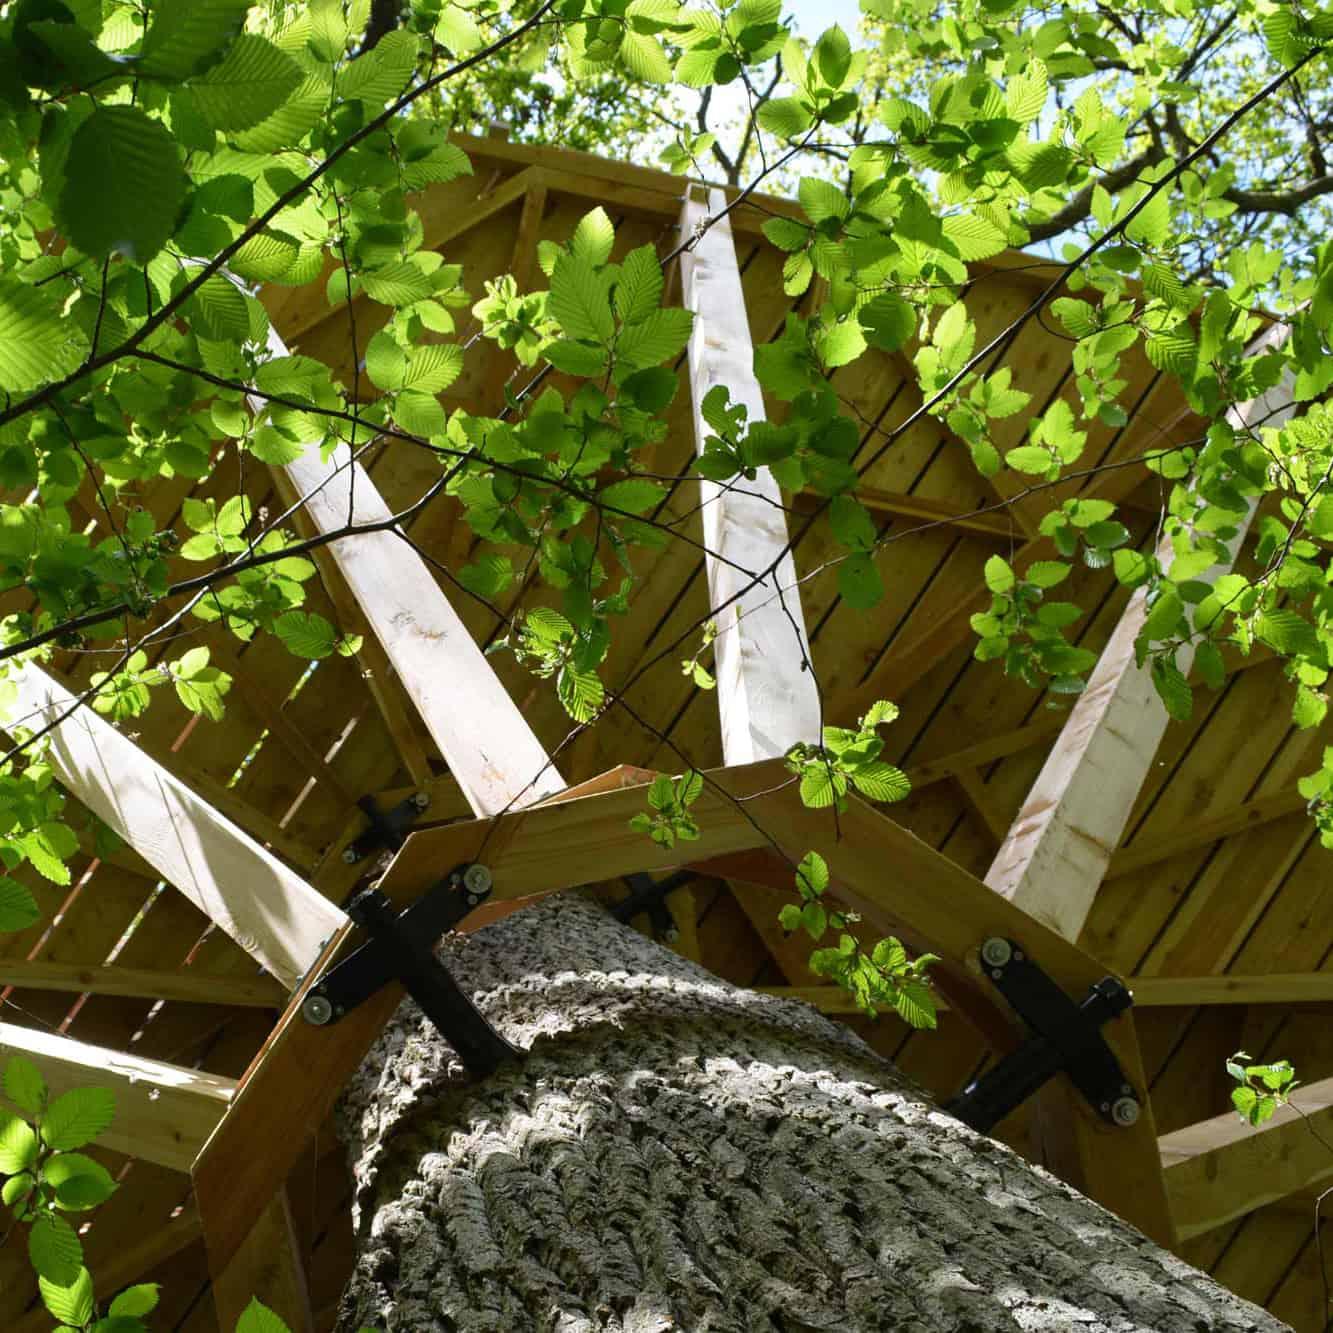 heavy-treehouse-platform-circle-construction-using-8-screws